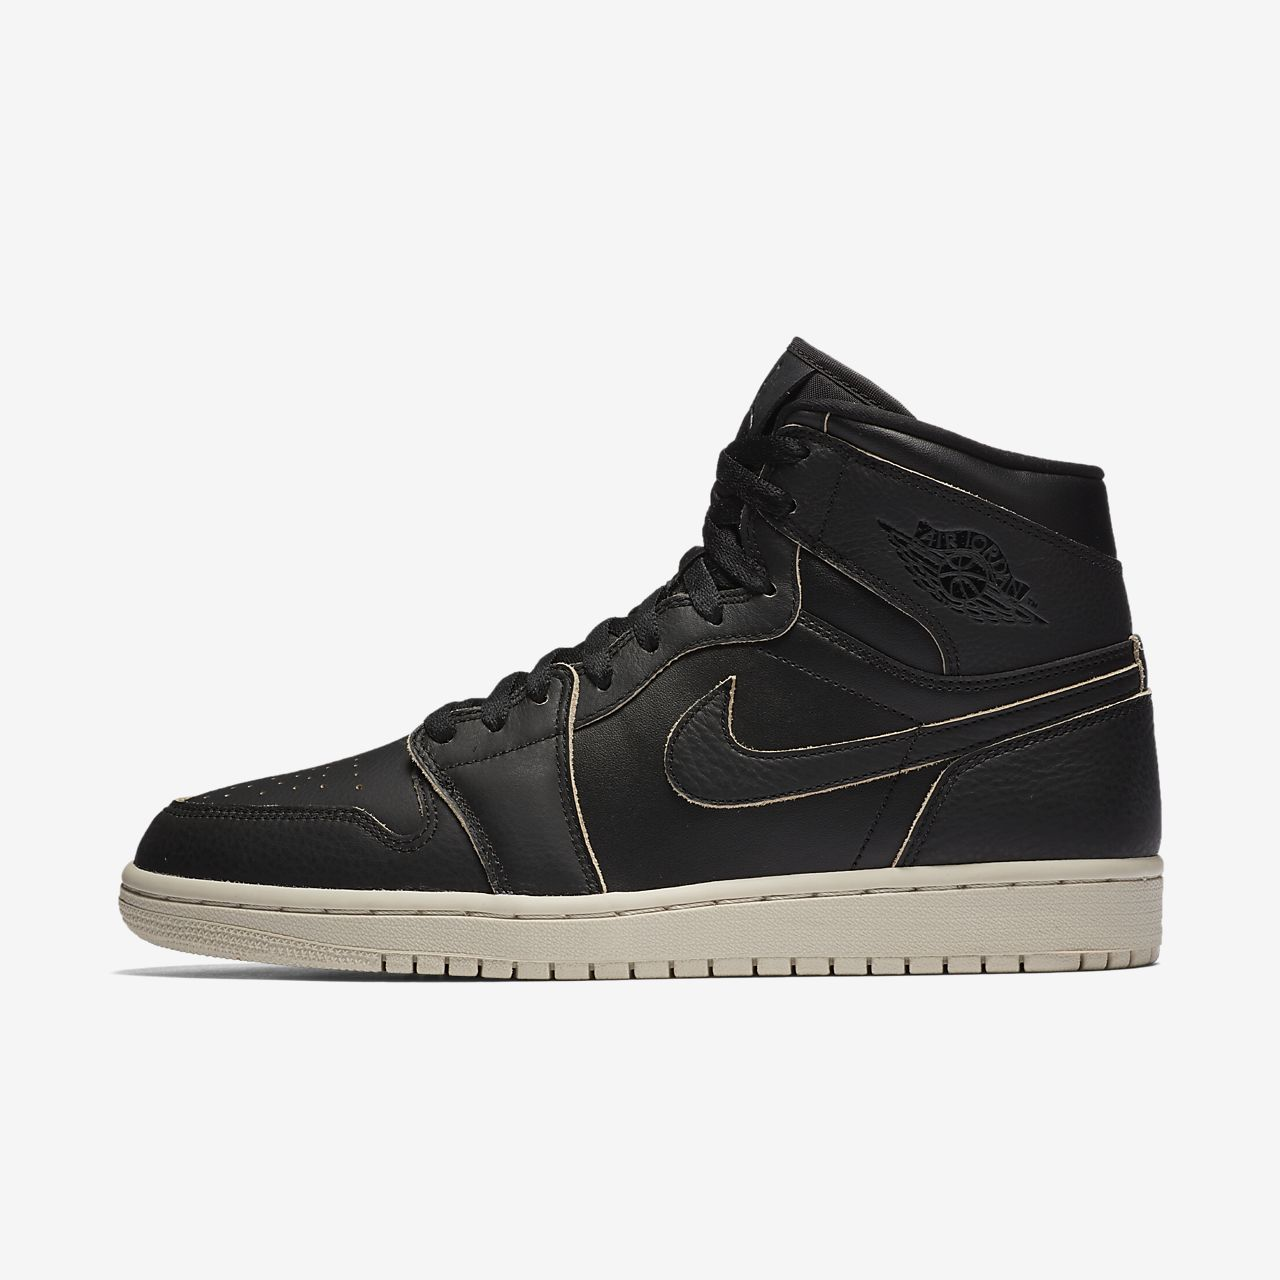 Jordan 1 Retro Haut Chaussures Haut De Gamme Gris E 3hVgQ